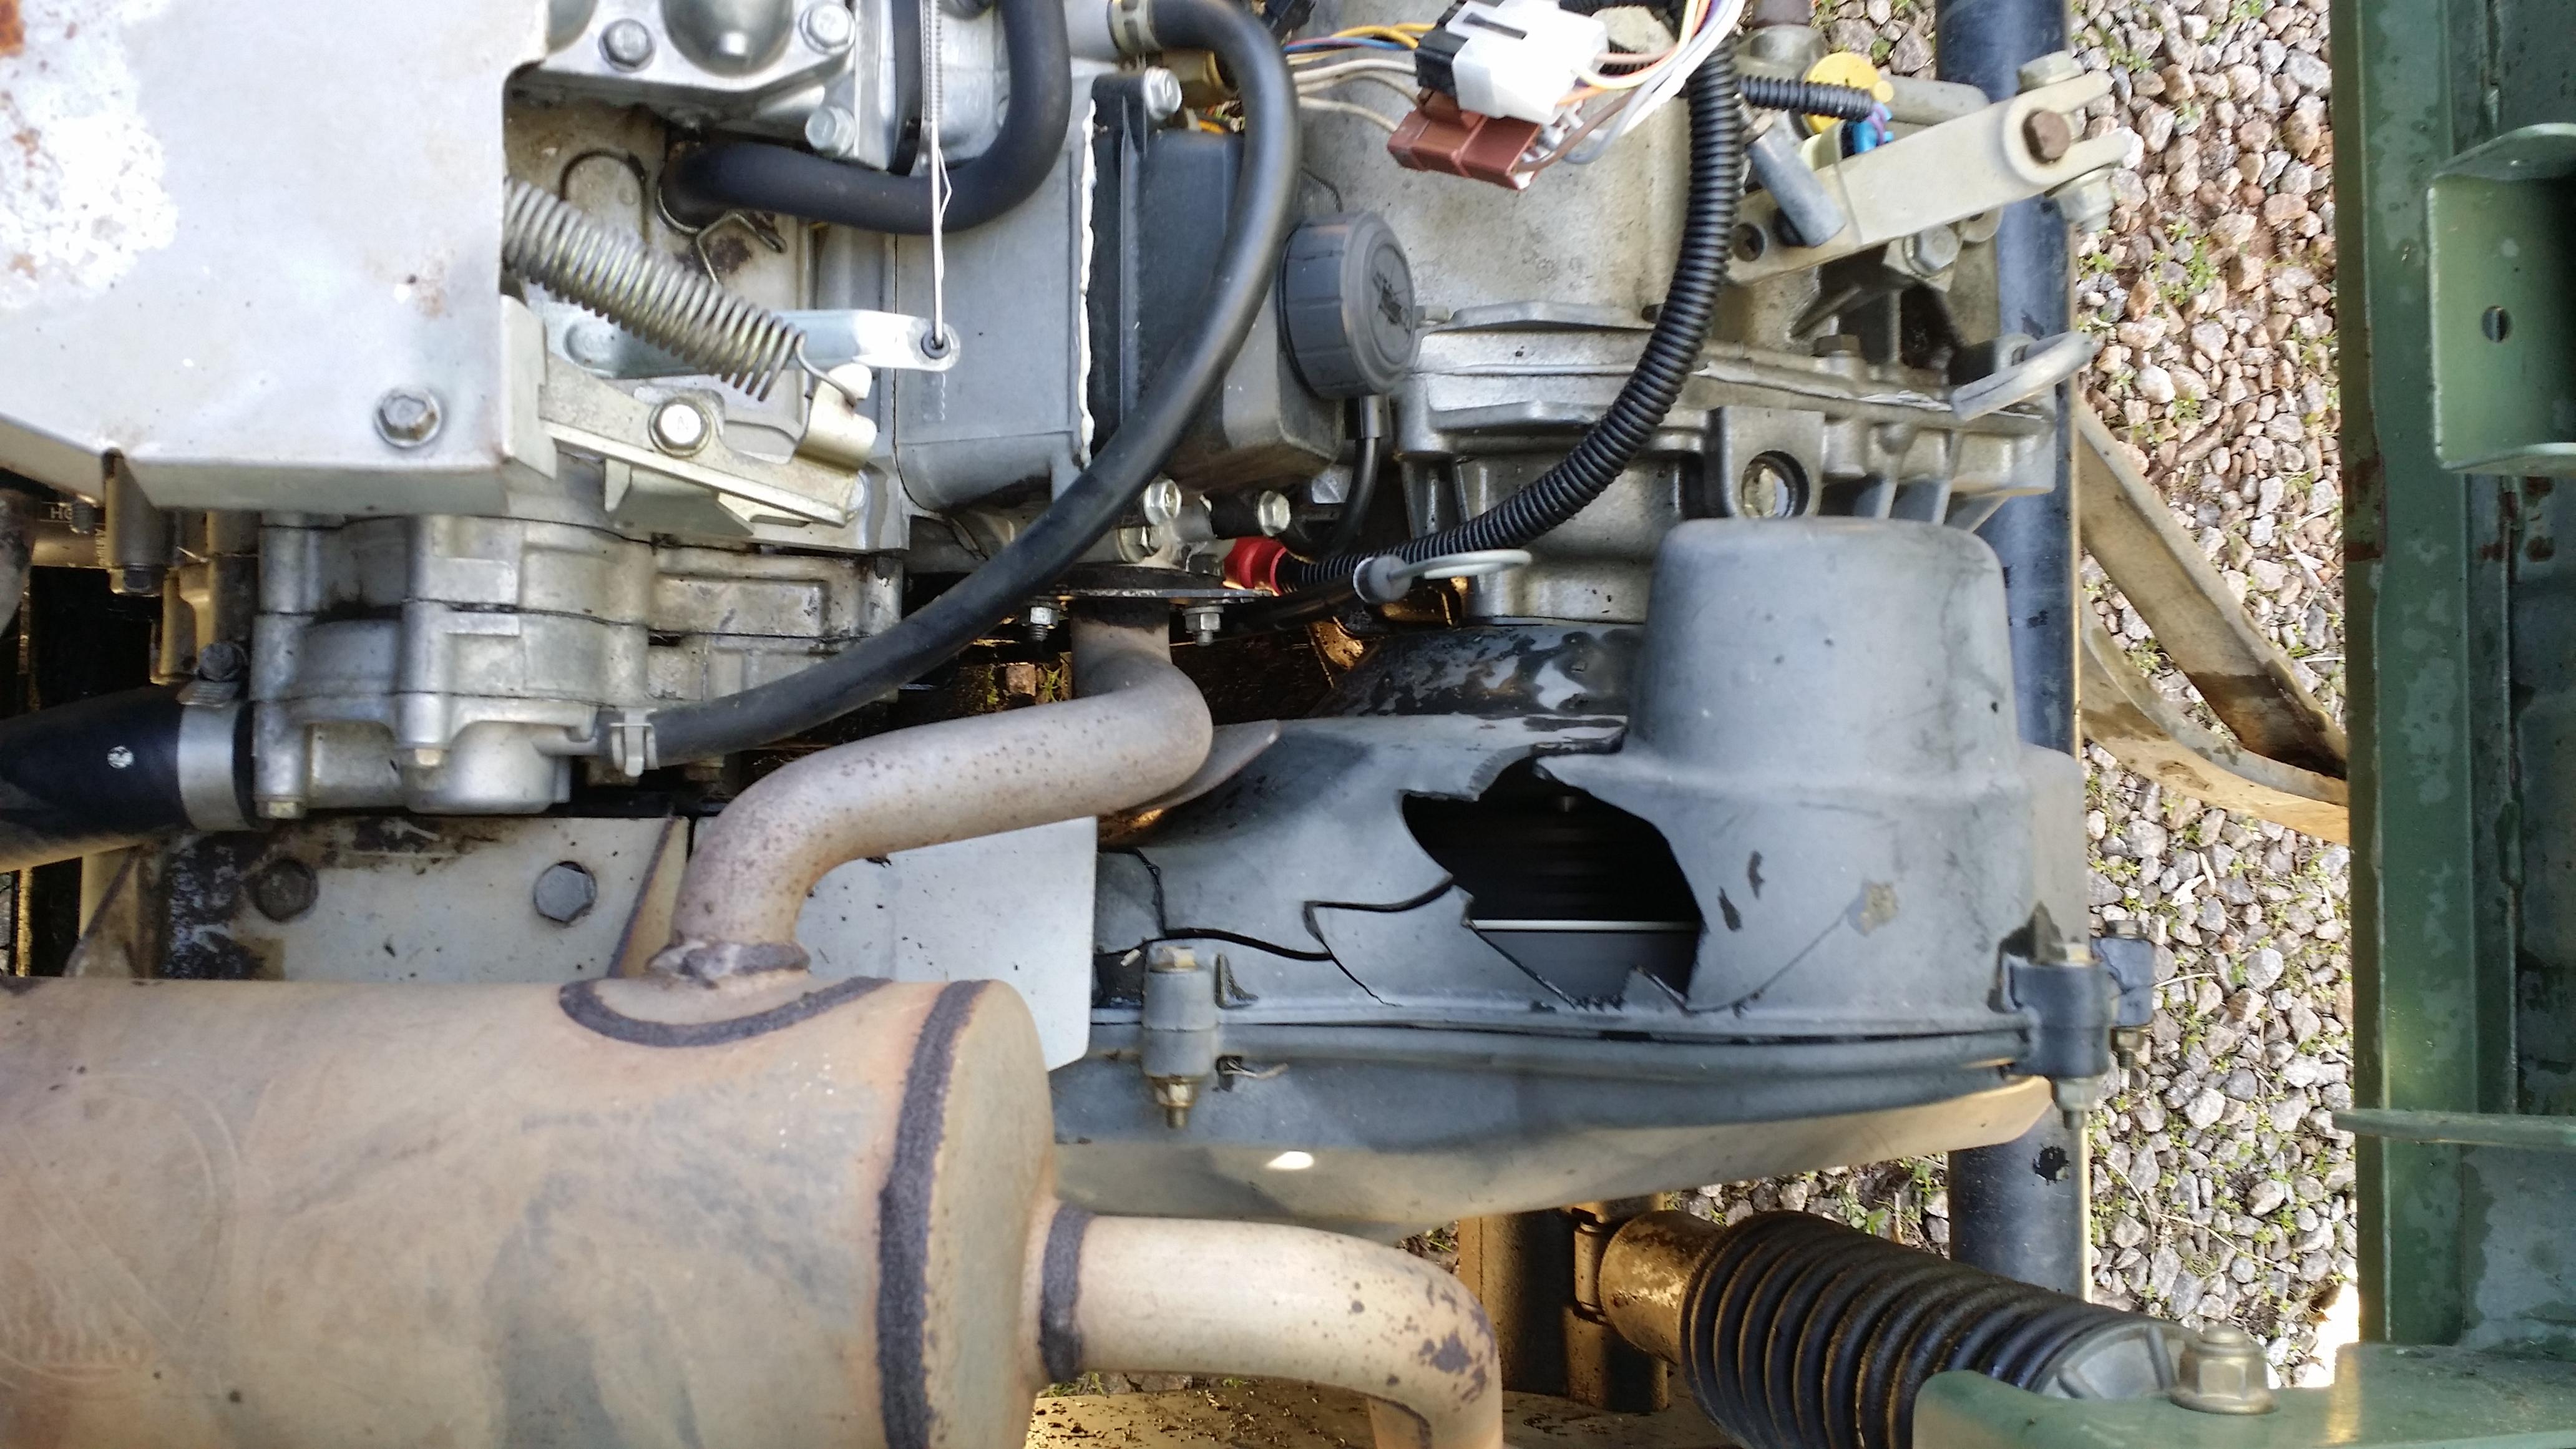 John Deere Hpx 4x4 Gas Gator Wiring Diagram New Guy In Search Of Year Model Forums 4128x2322